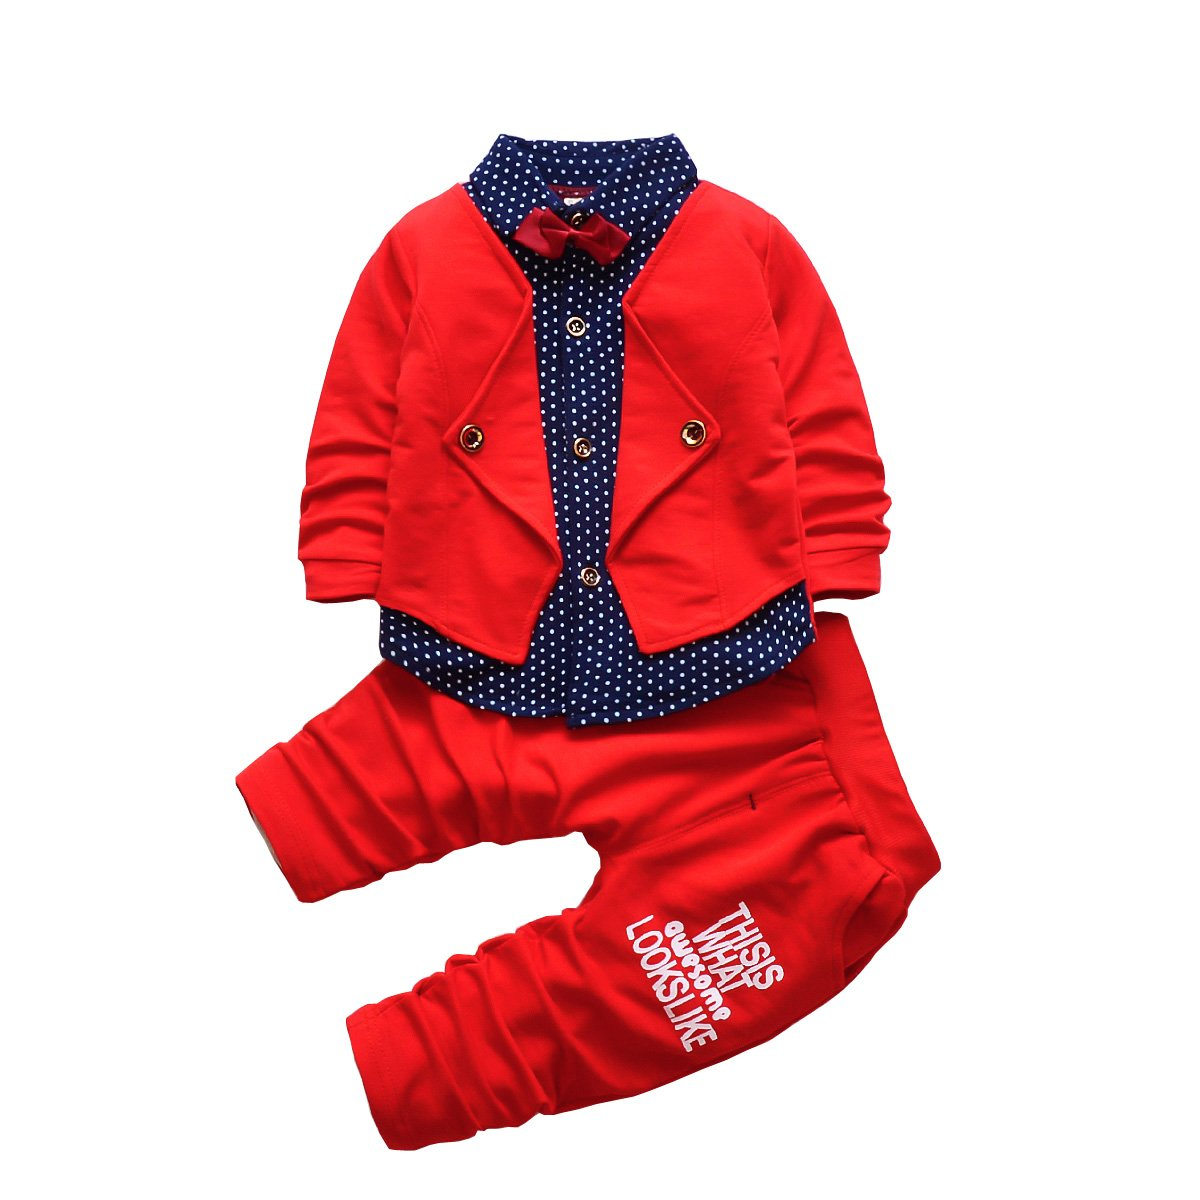 2pcs Baby Boy Dress Clothes Toddler Outfits Infant Tuxedo Formal Suits Set Shirt + Pants